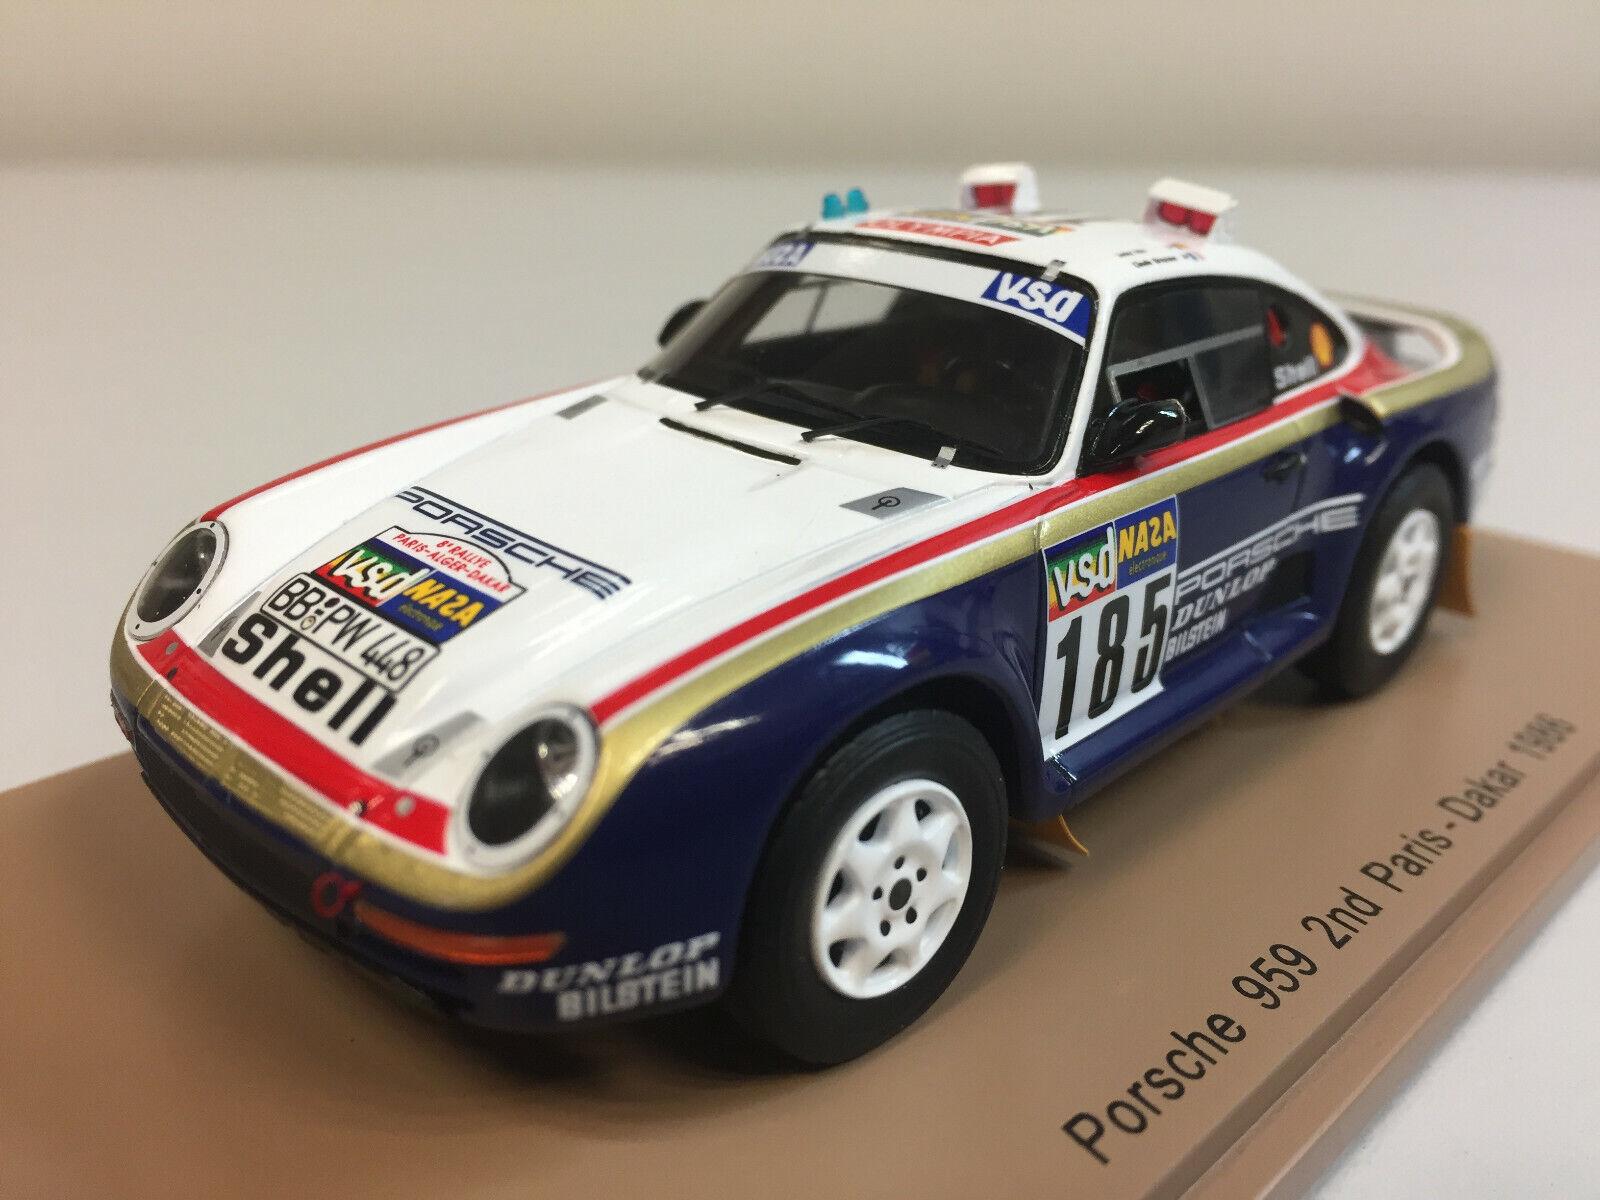 Spark Porsche 959 n°185 2ème Paris Dakar 1986 J. Ickx 1 43 S7814